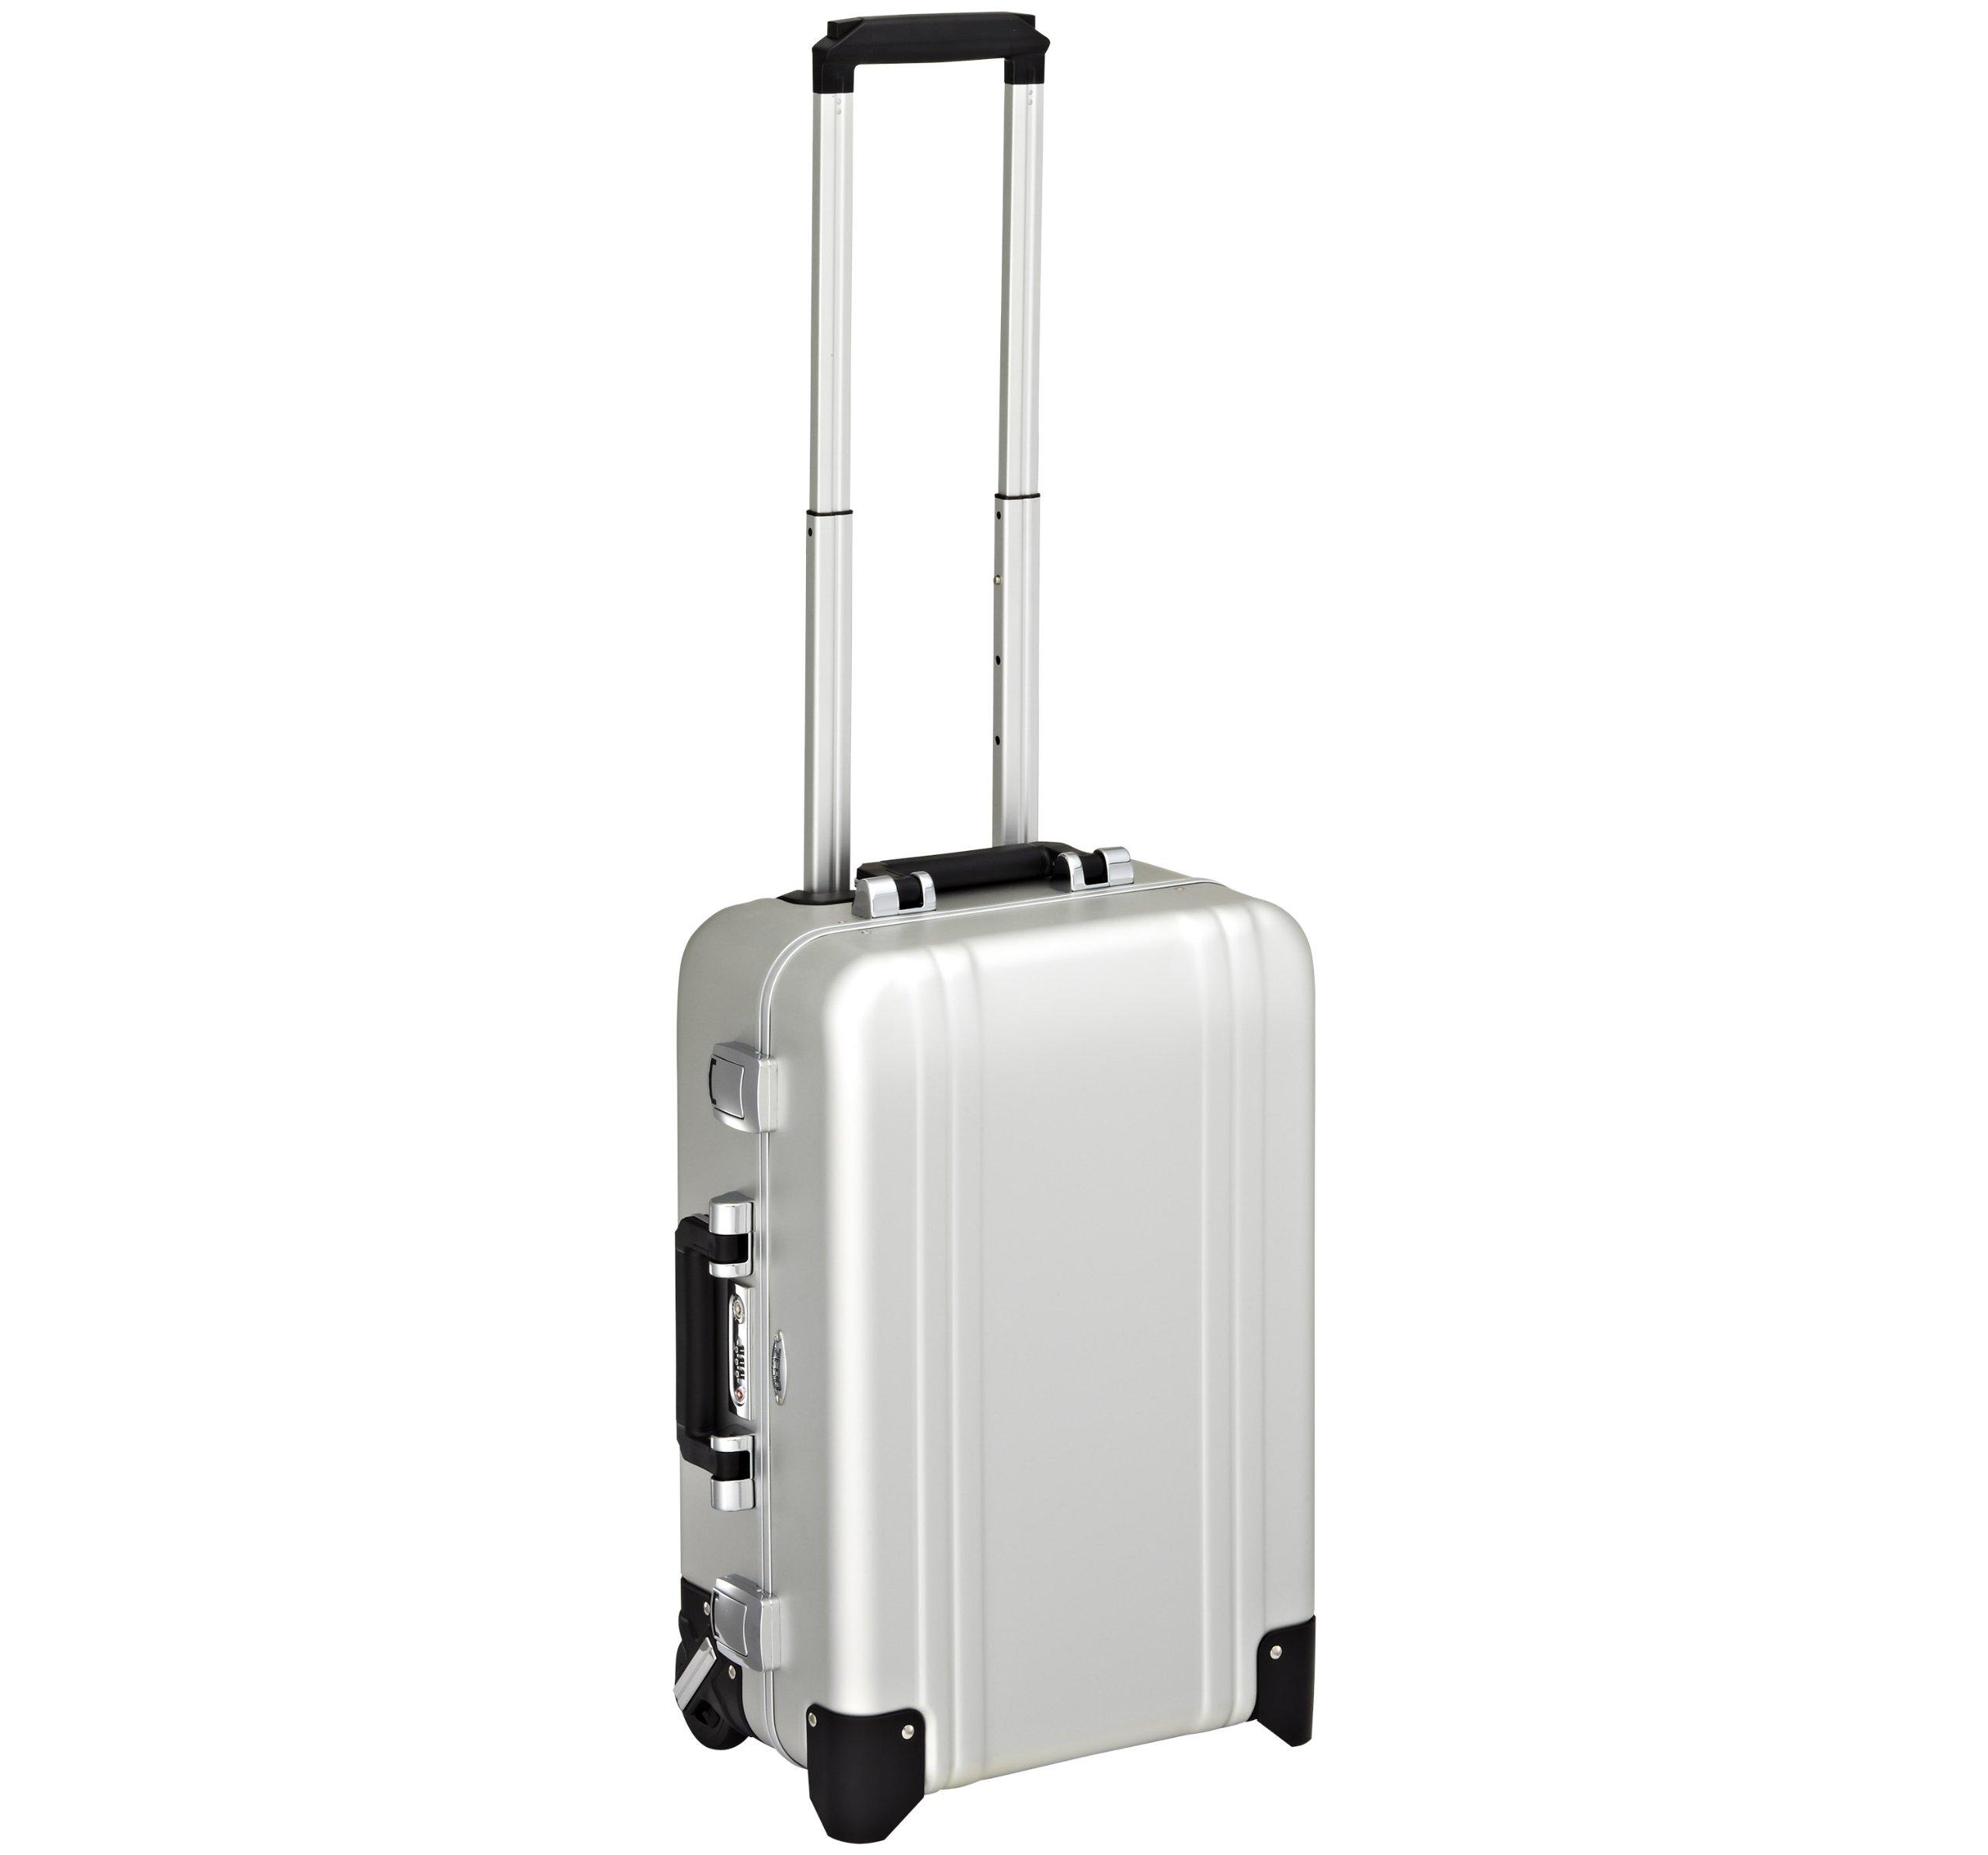 Zero Halliburton Classic Aluminum Carry On 2 Wheel Travel Case, Silver, One Size